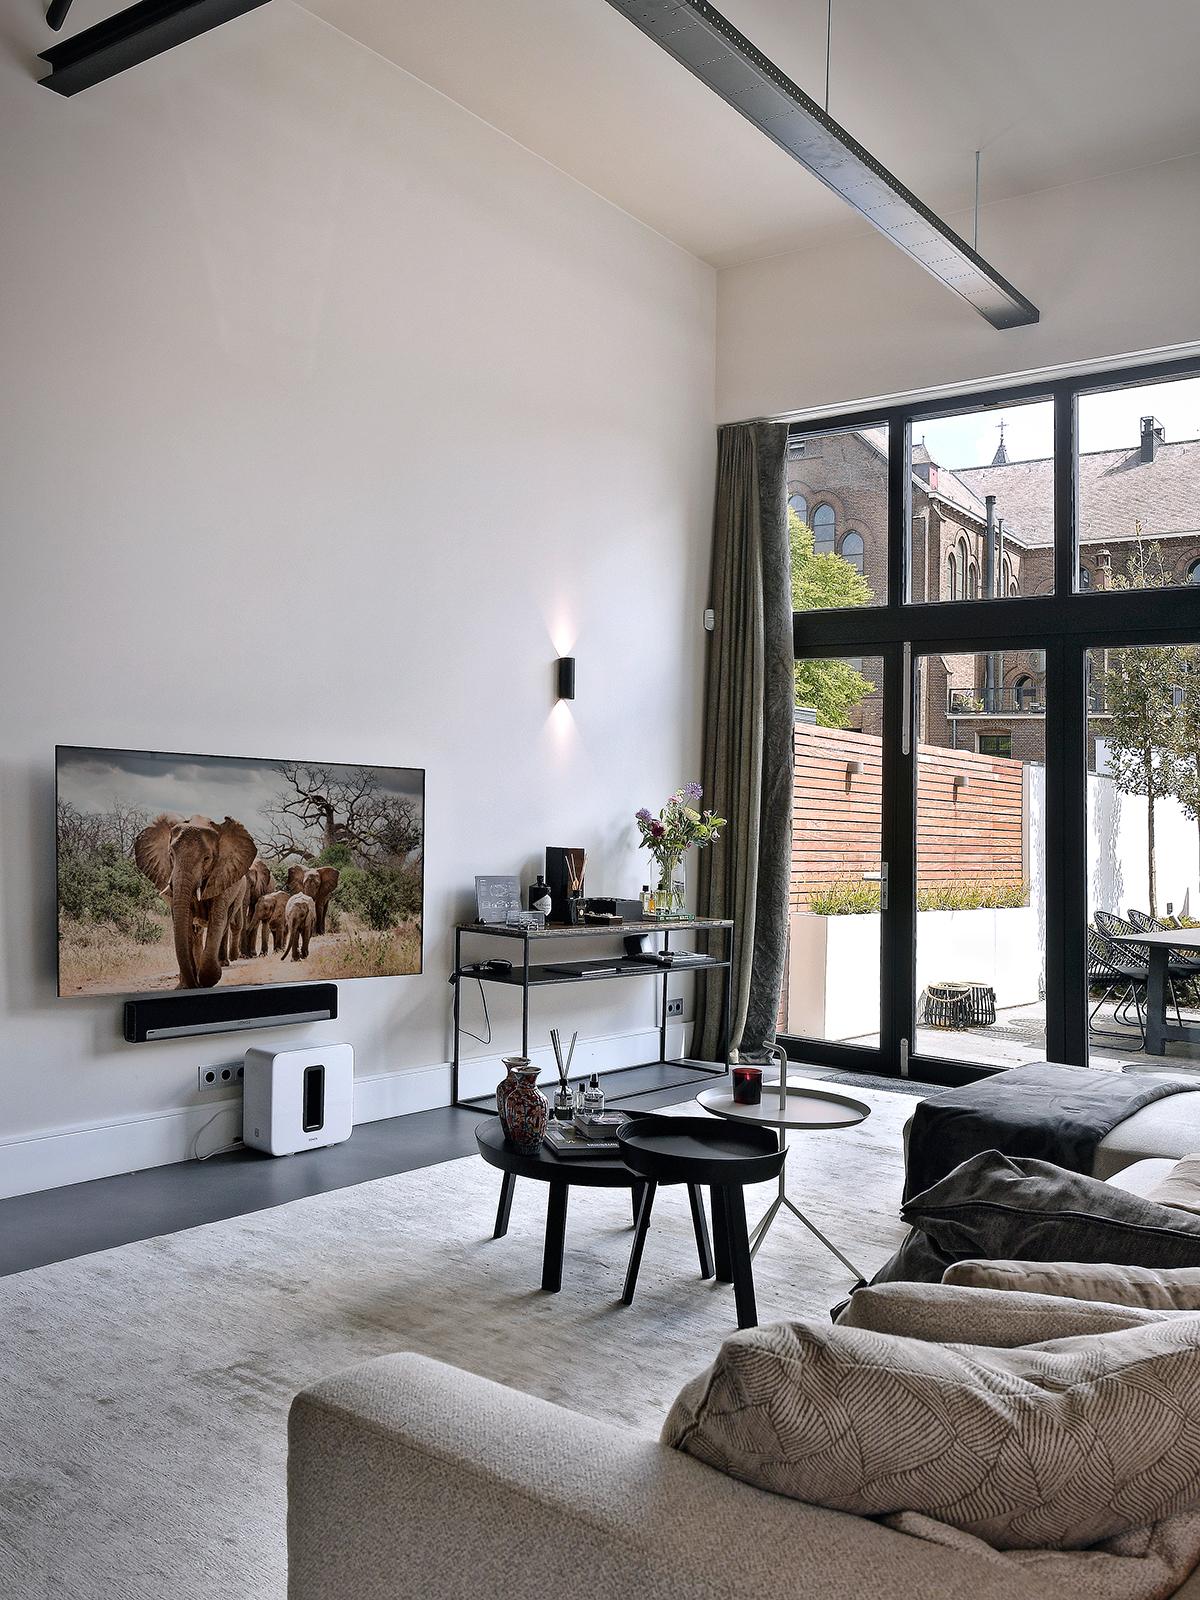 wifimedia, the art of living, smart home